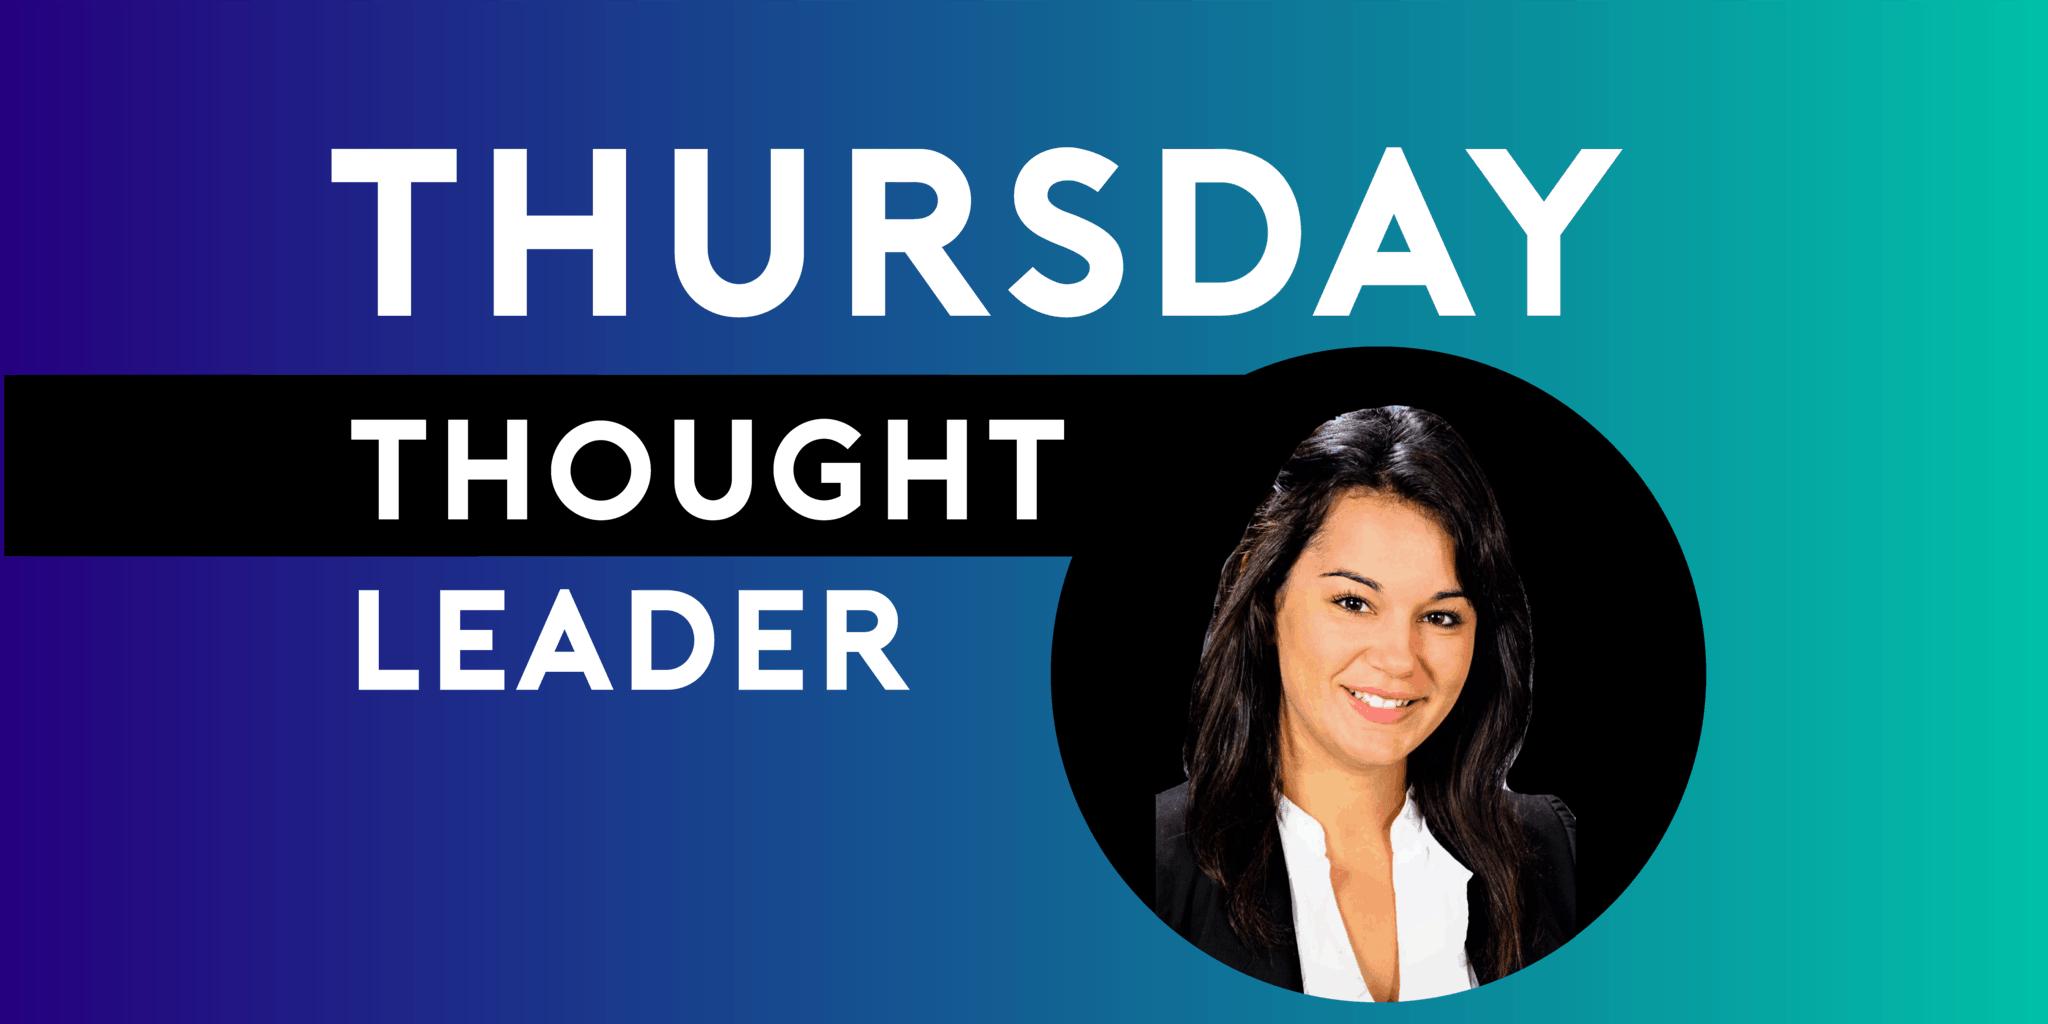 Aisha Monem Draznik of Cintas is this week's LegalNet Inc Thursday Thought Leader